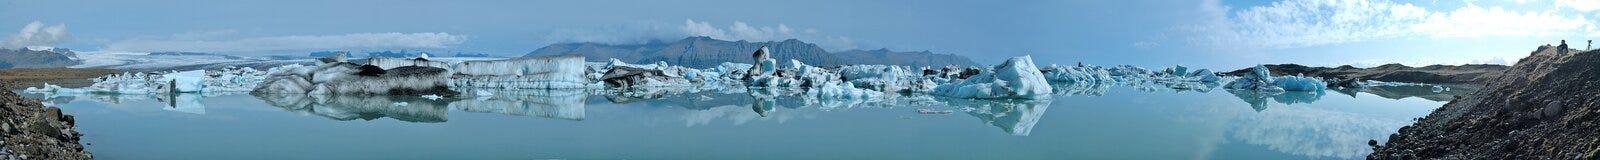 jokulsarlon πανόραμα λιμνών Στοκ εικόνες με δικαίωμα ελεύθερης χρήσης